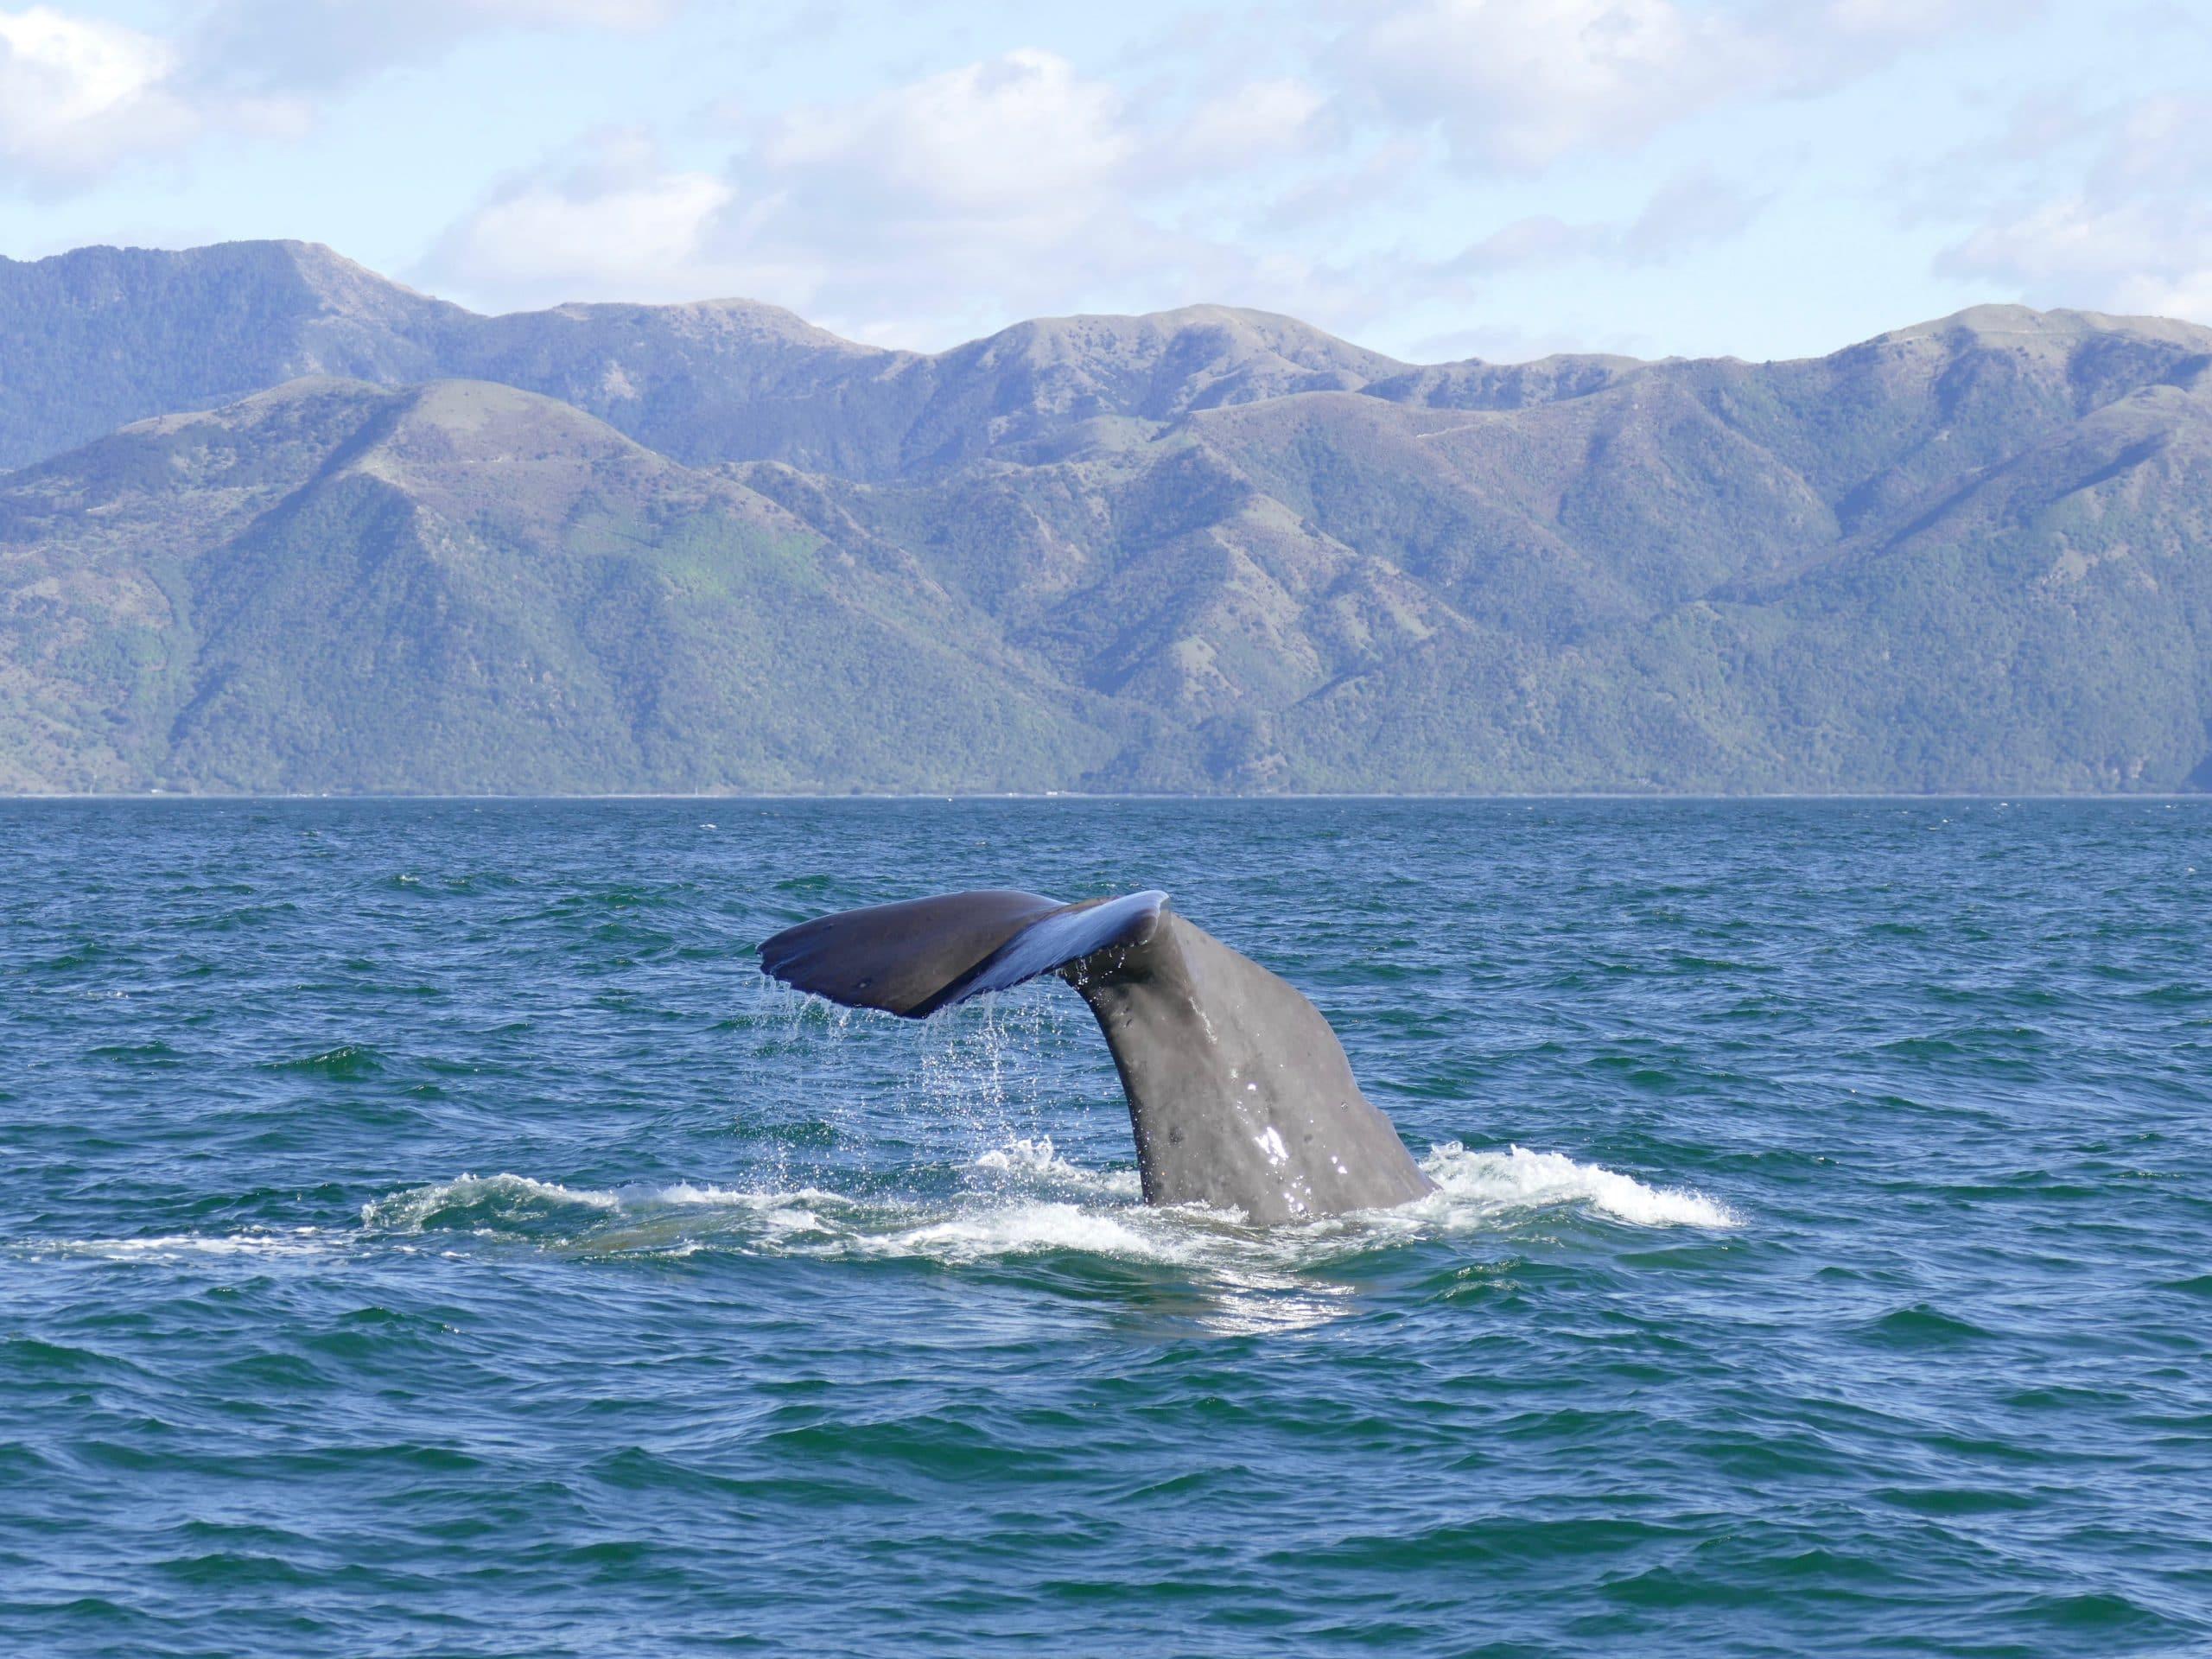 Pottwal (C) Oliver Dirr / Whaletrips